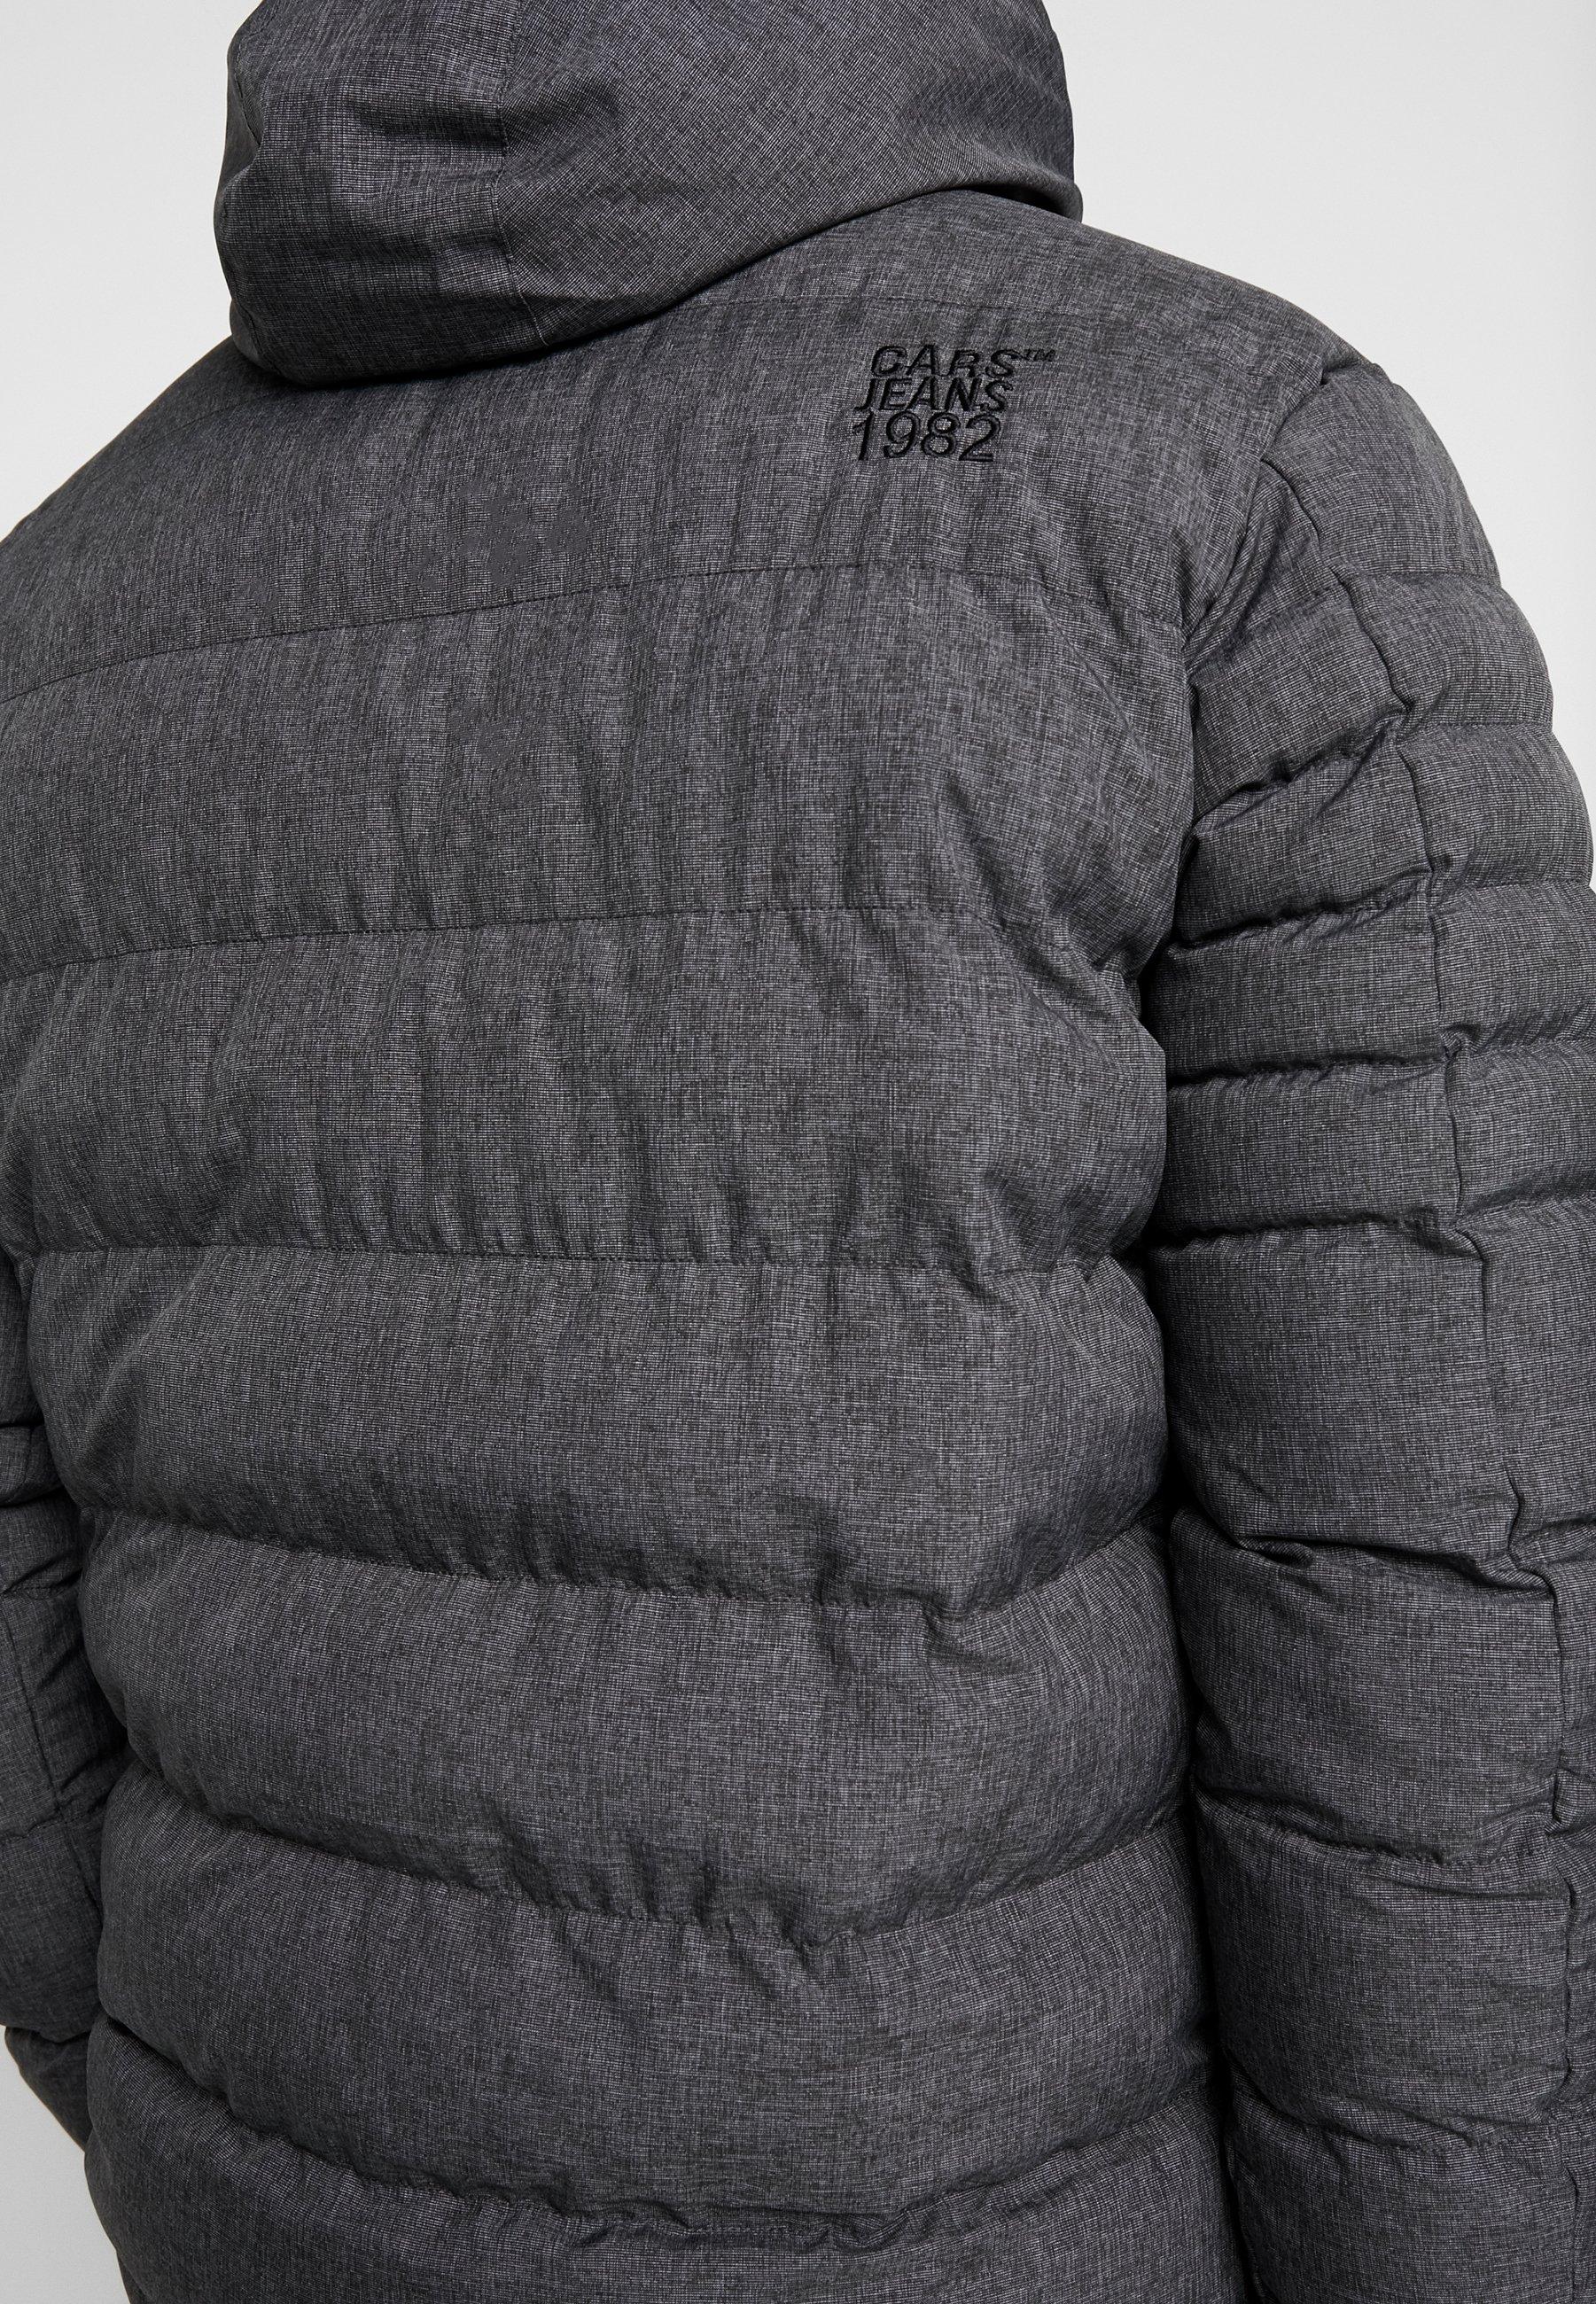 Antracite Cars D'hiver Jeans Cahill PolyVeste kiwXTOPZlu